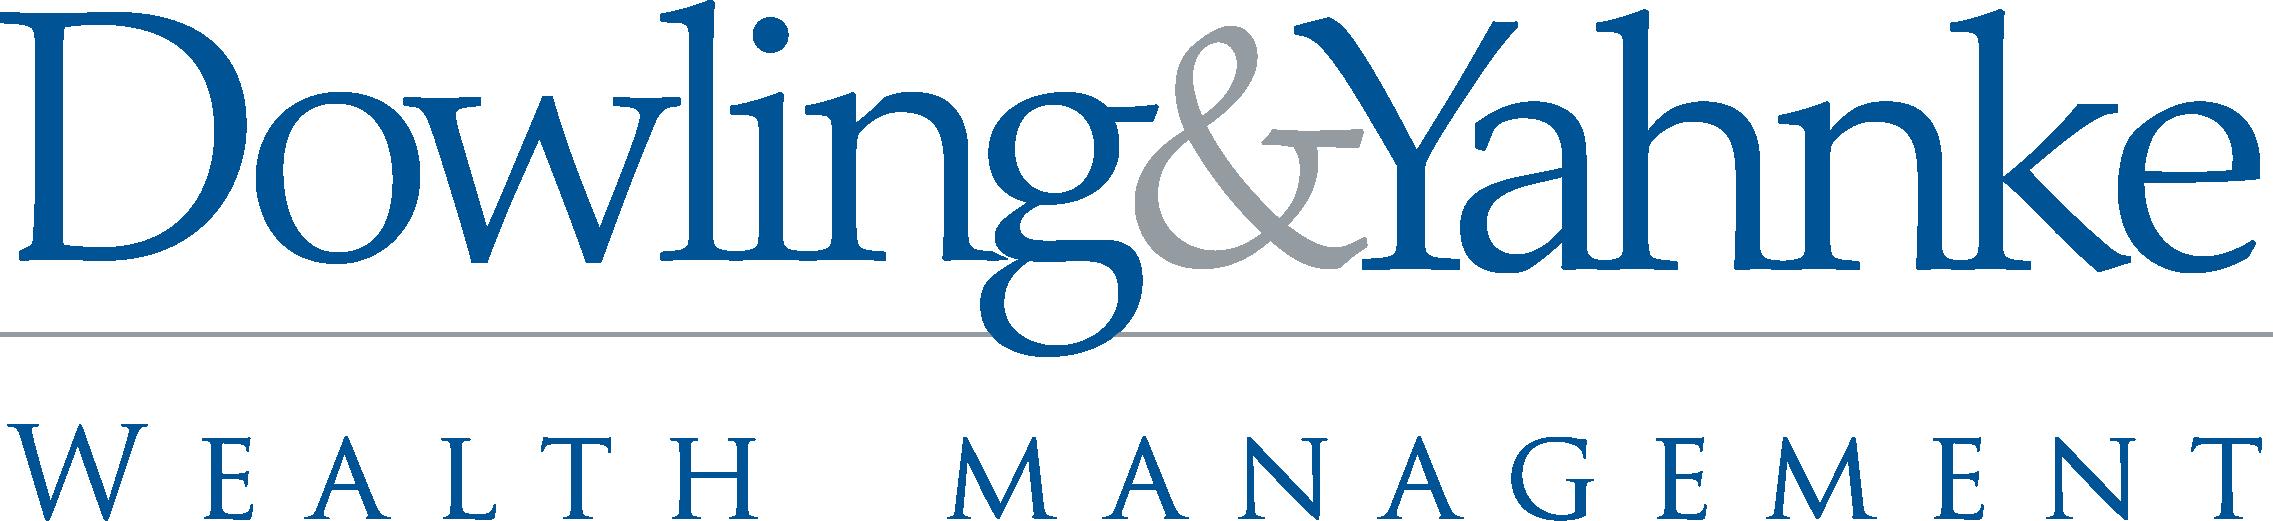 Dowling & Yahnke Logo